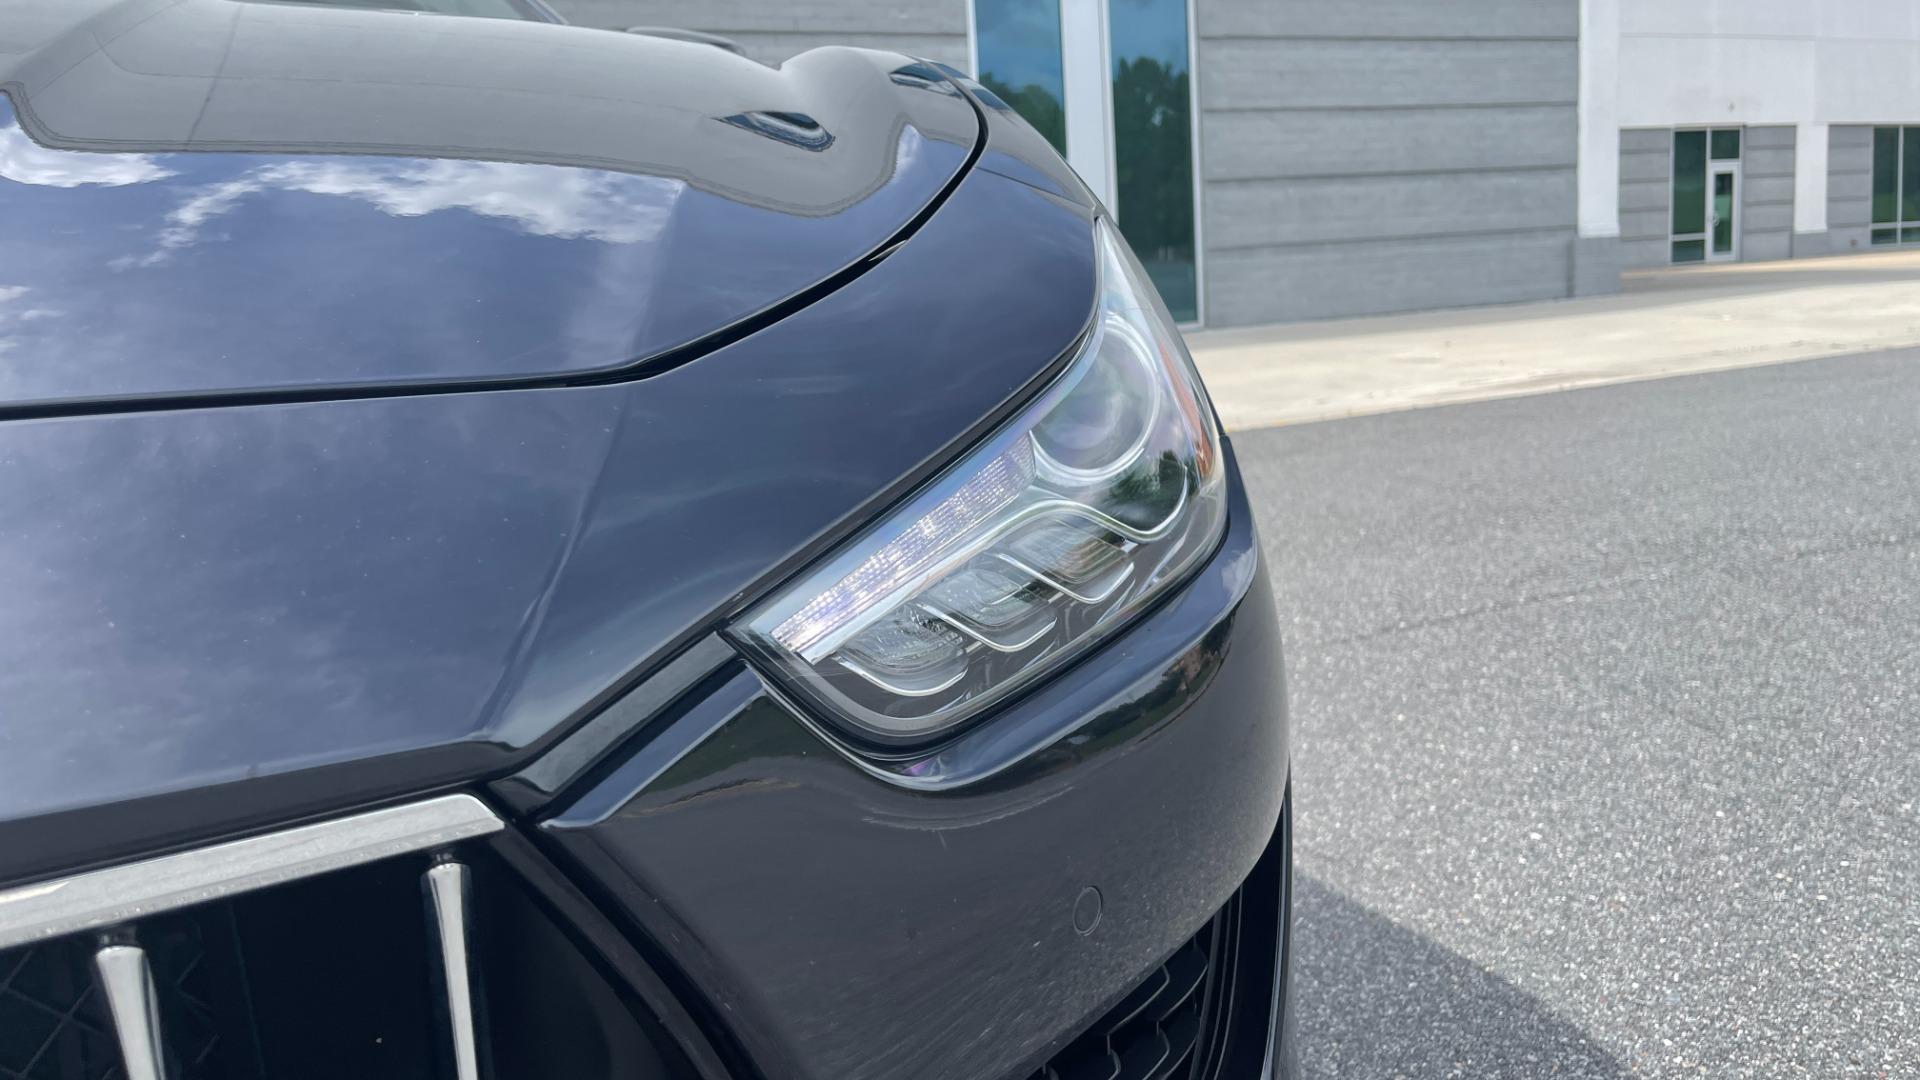 Used 2018 Maserati GHIBLI S Q4 SEDAN / AWD / 3.0L V6 / SUNROOF / NAV / REARVIEW for sale $51,995 at Formula Imports in Charlotte NC 28227 12